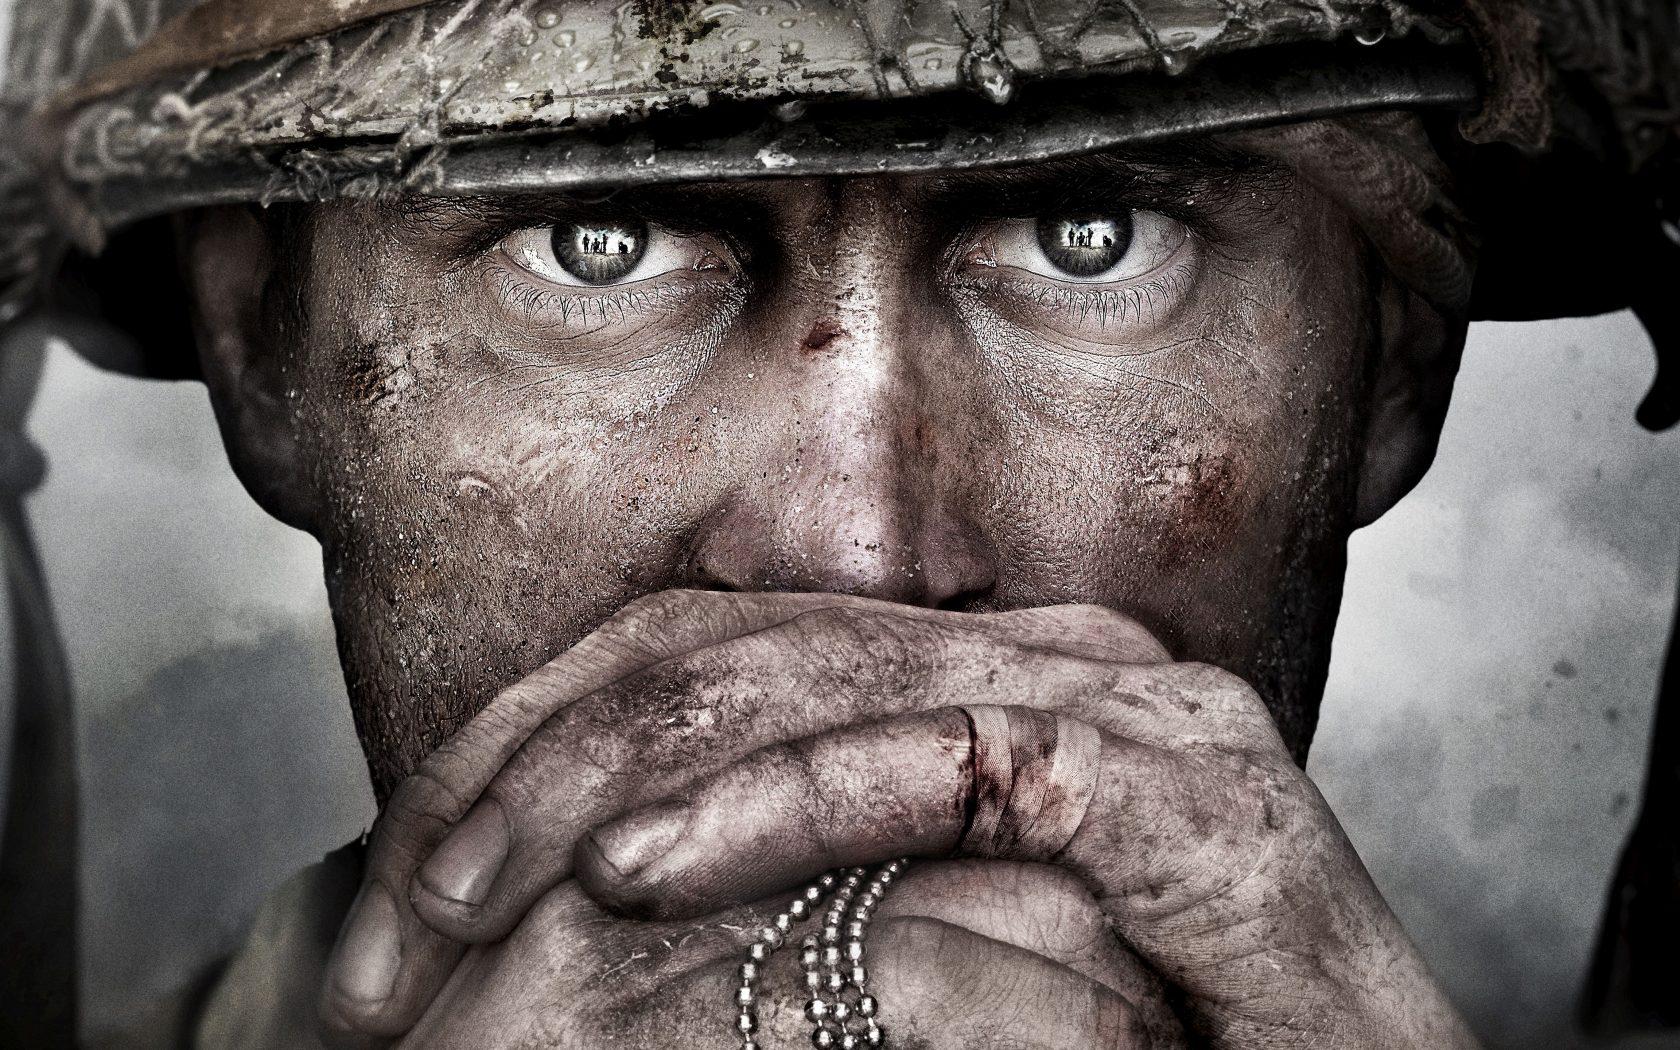 Call Of Duty Ww2 Wallpaper 4k: Call Of Duty WW2 Game Soldier 5K Wallpaper